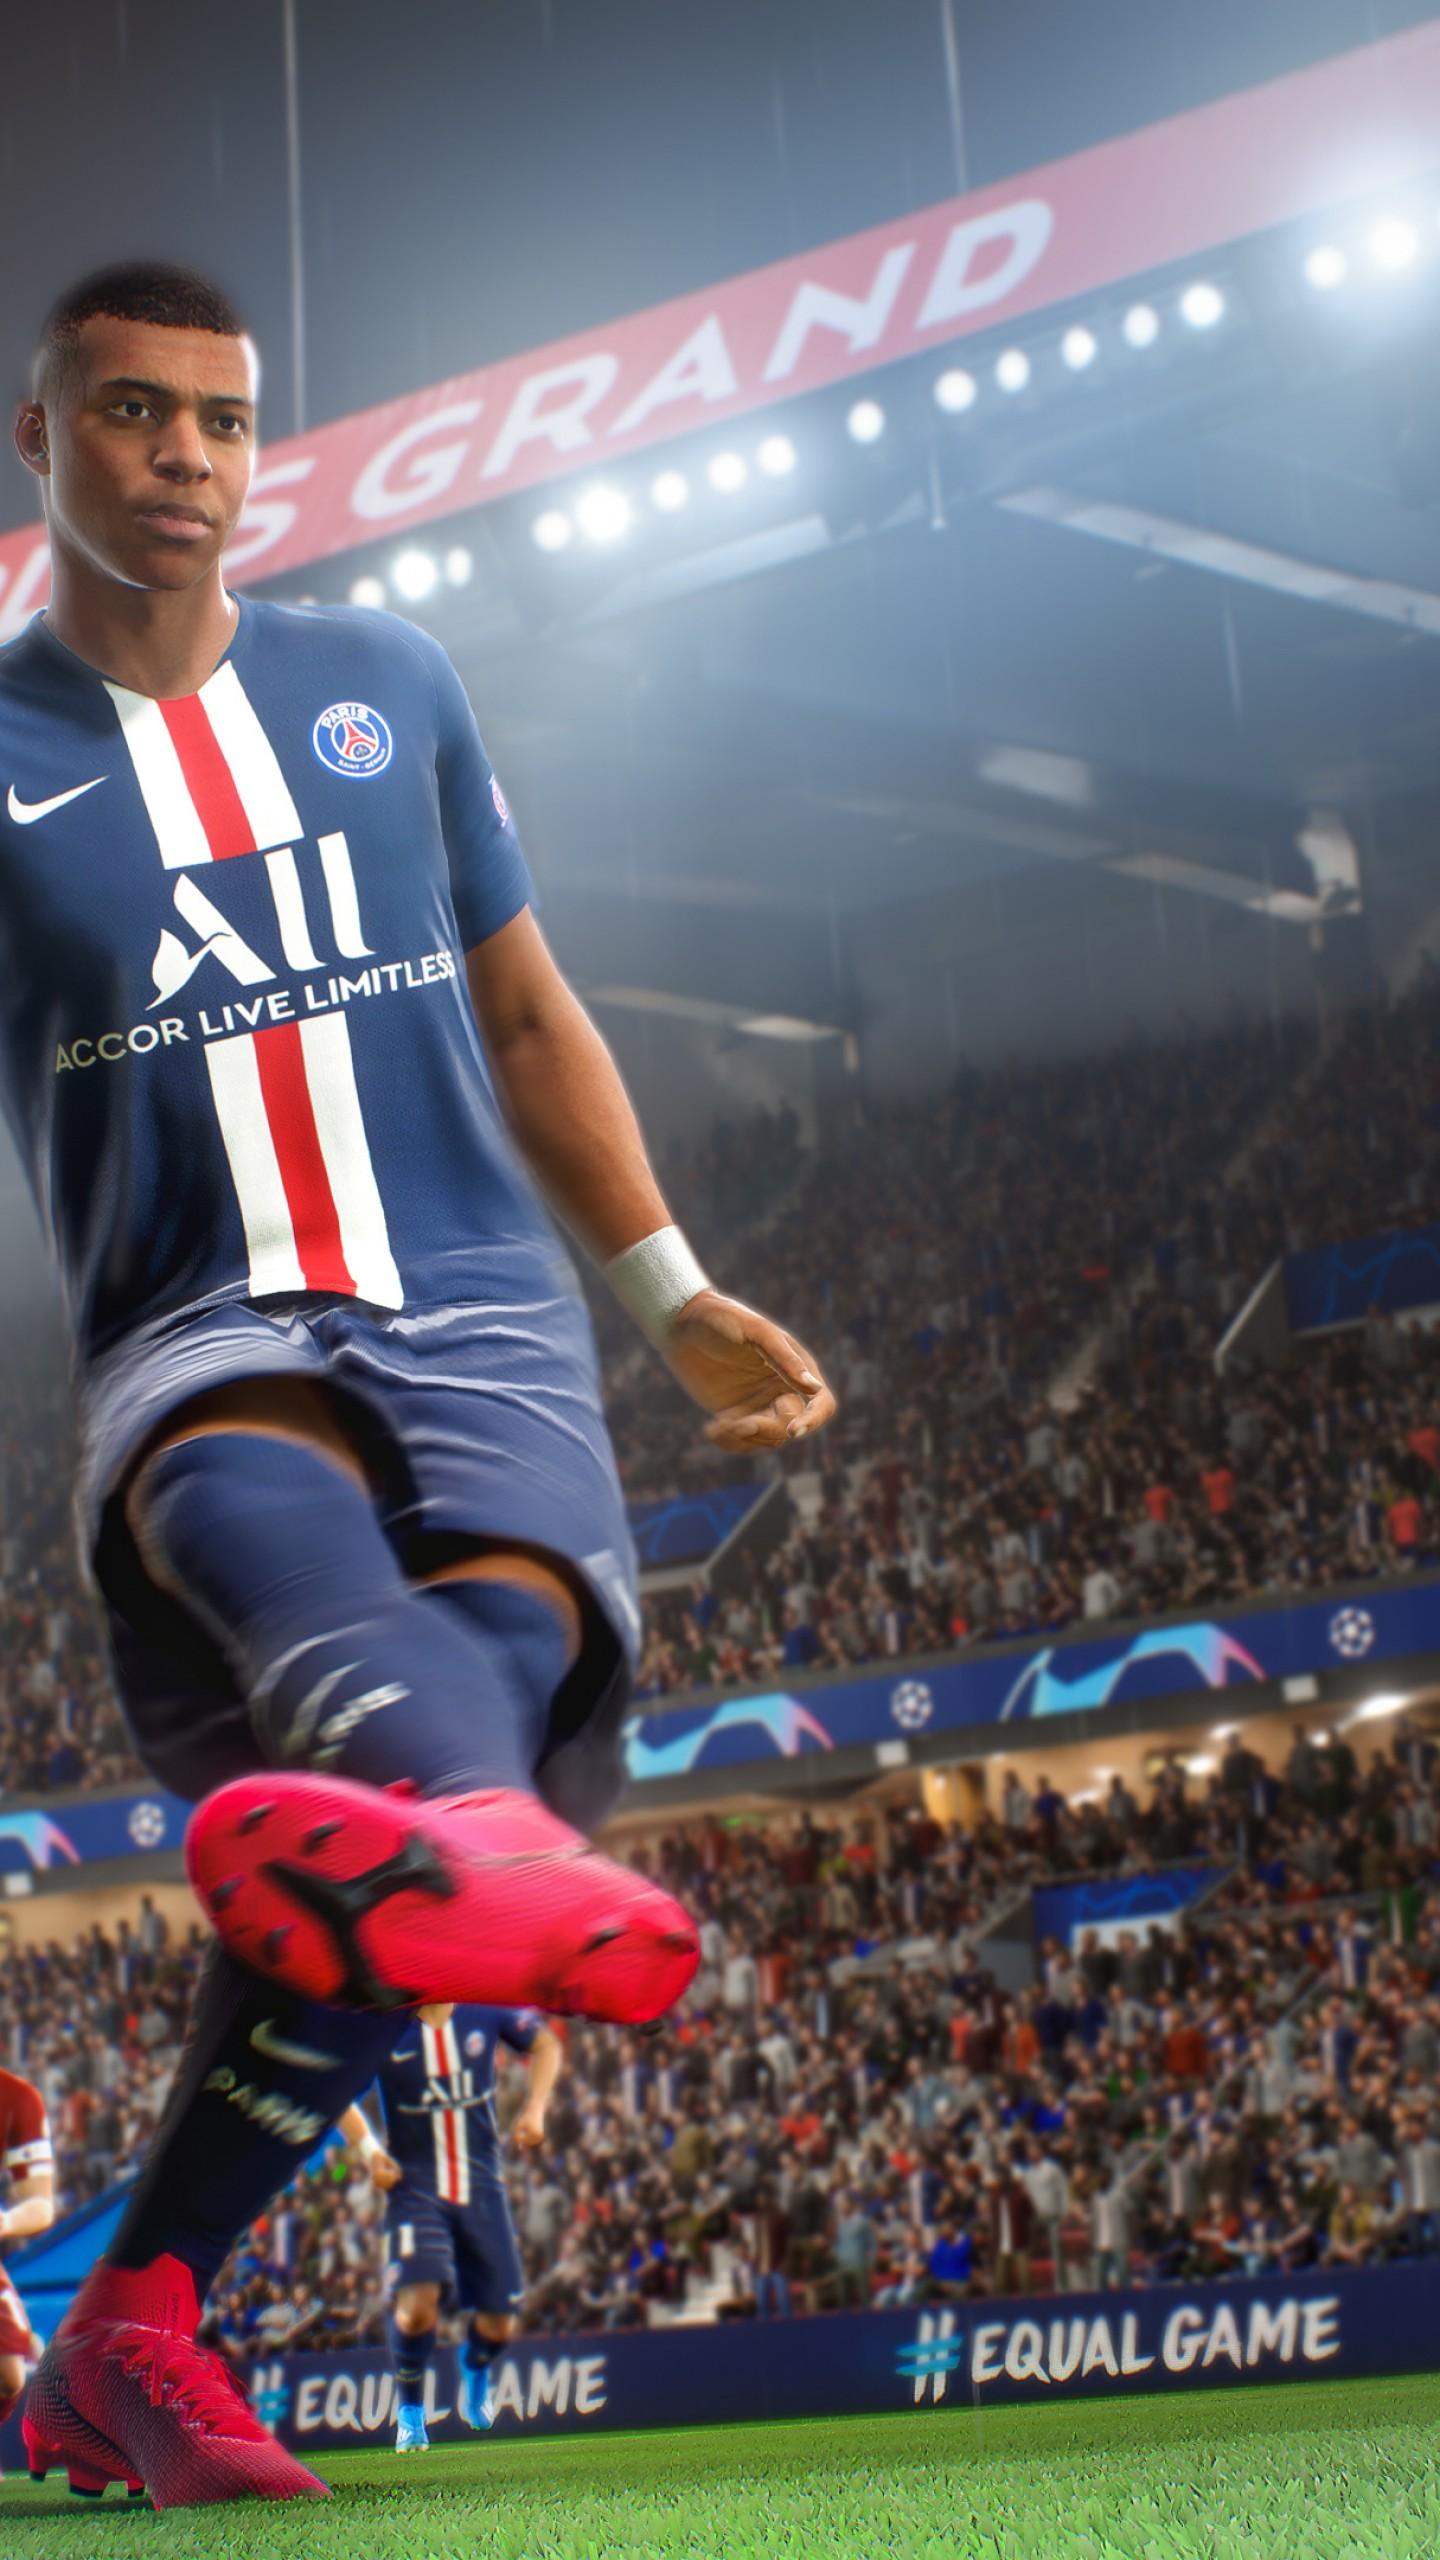 Wallpaper FIFA 21, screenshot, 4K, Games #23012